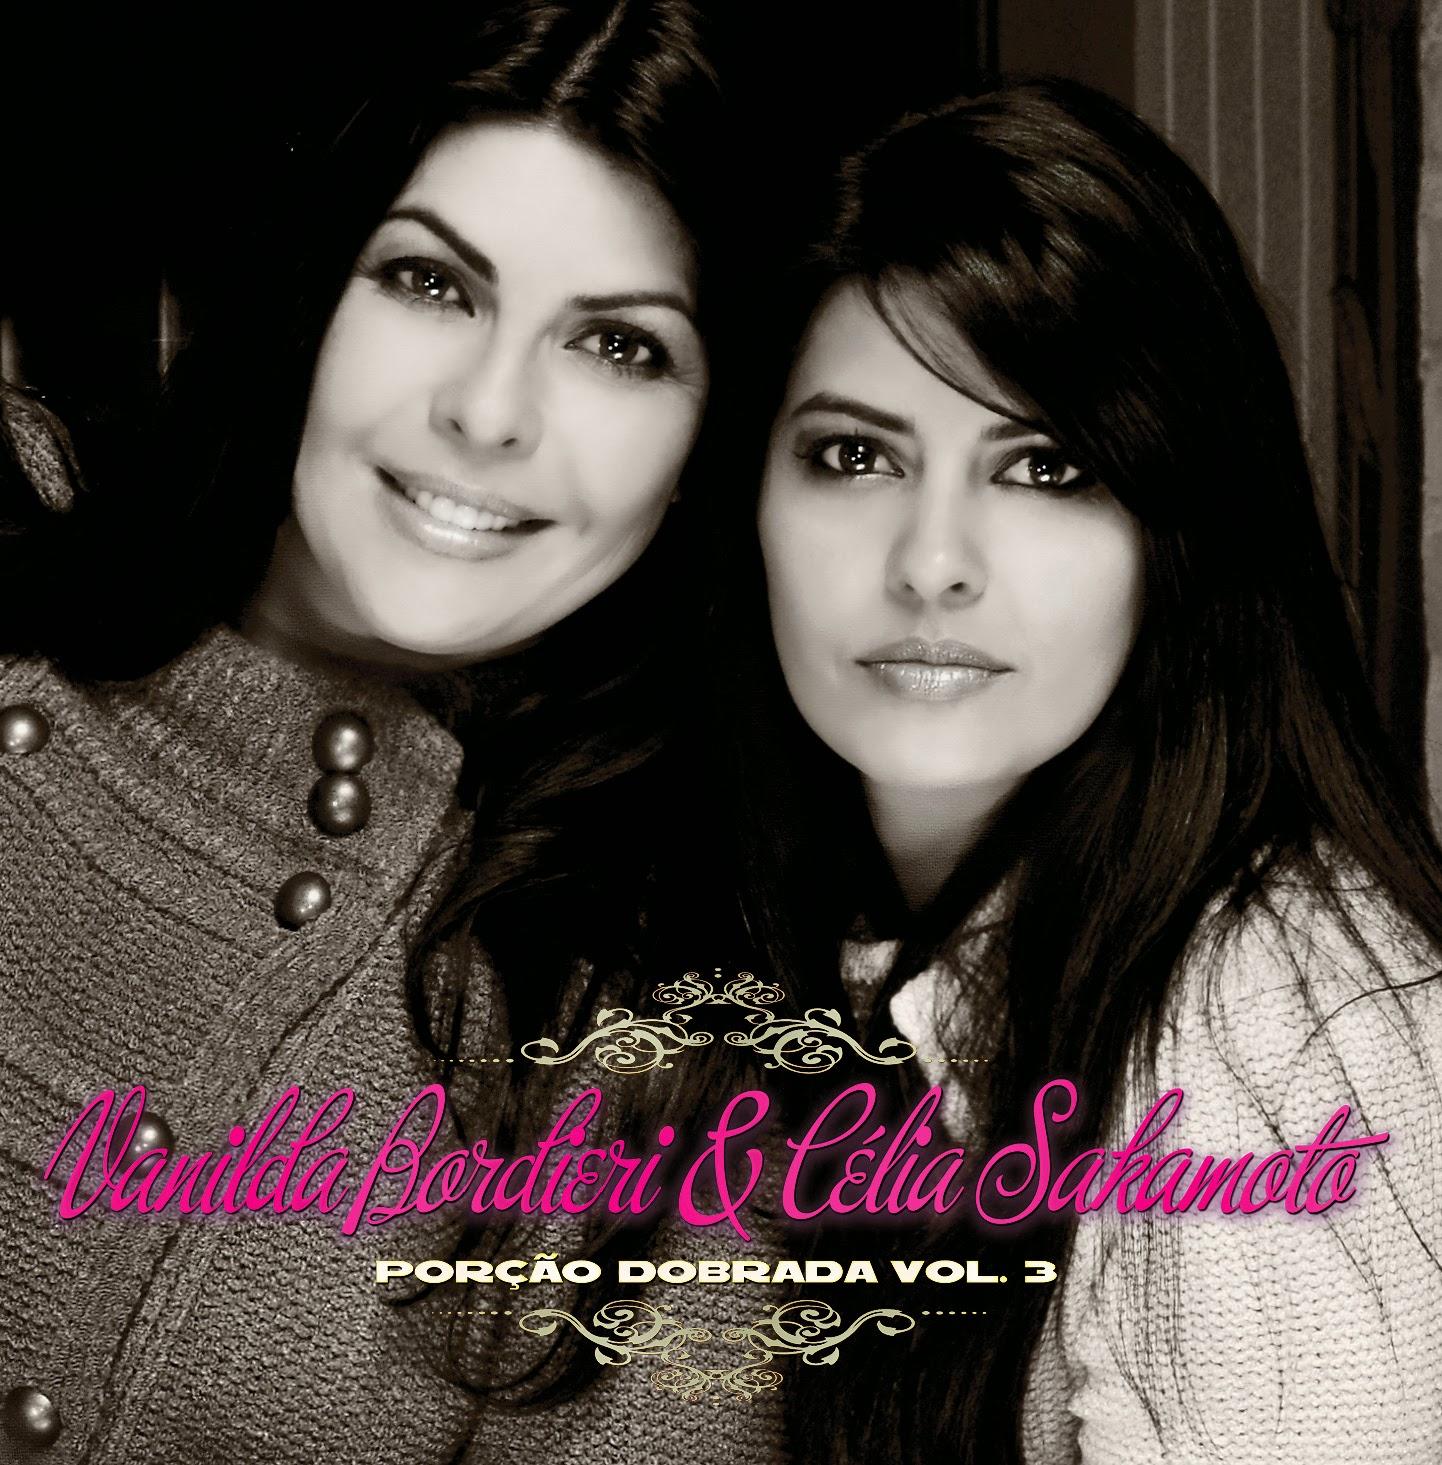 Vanilda Bordieri & Célia Sakamoto - Porção Dobrada 3 (2010)